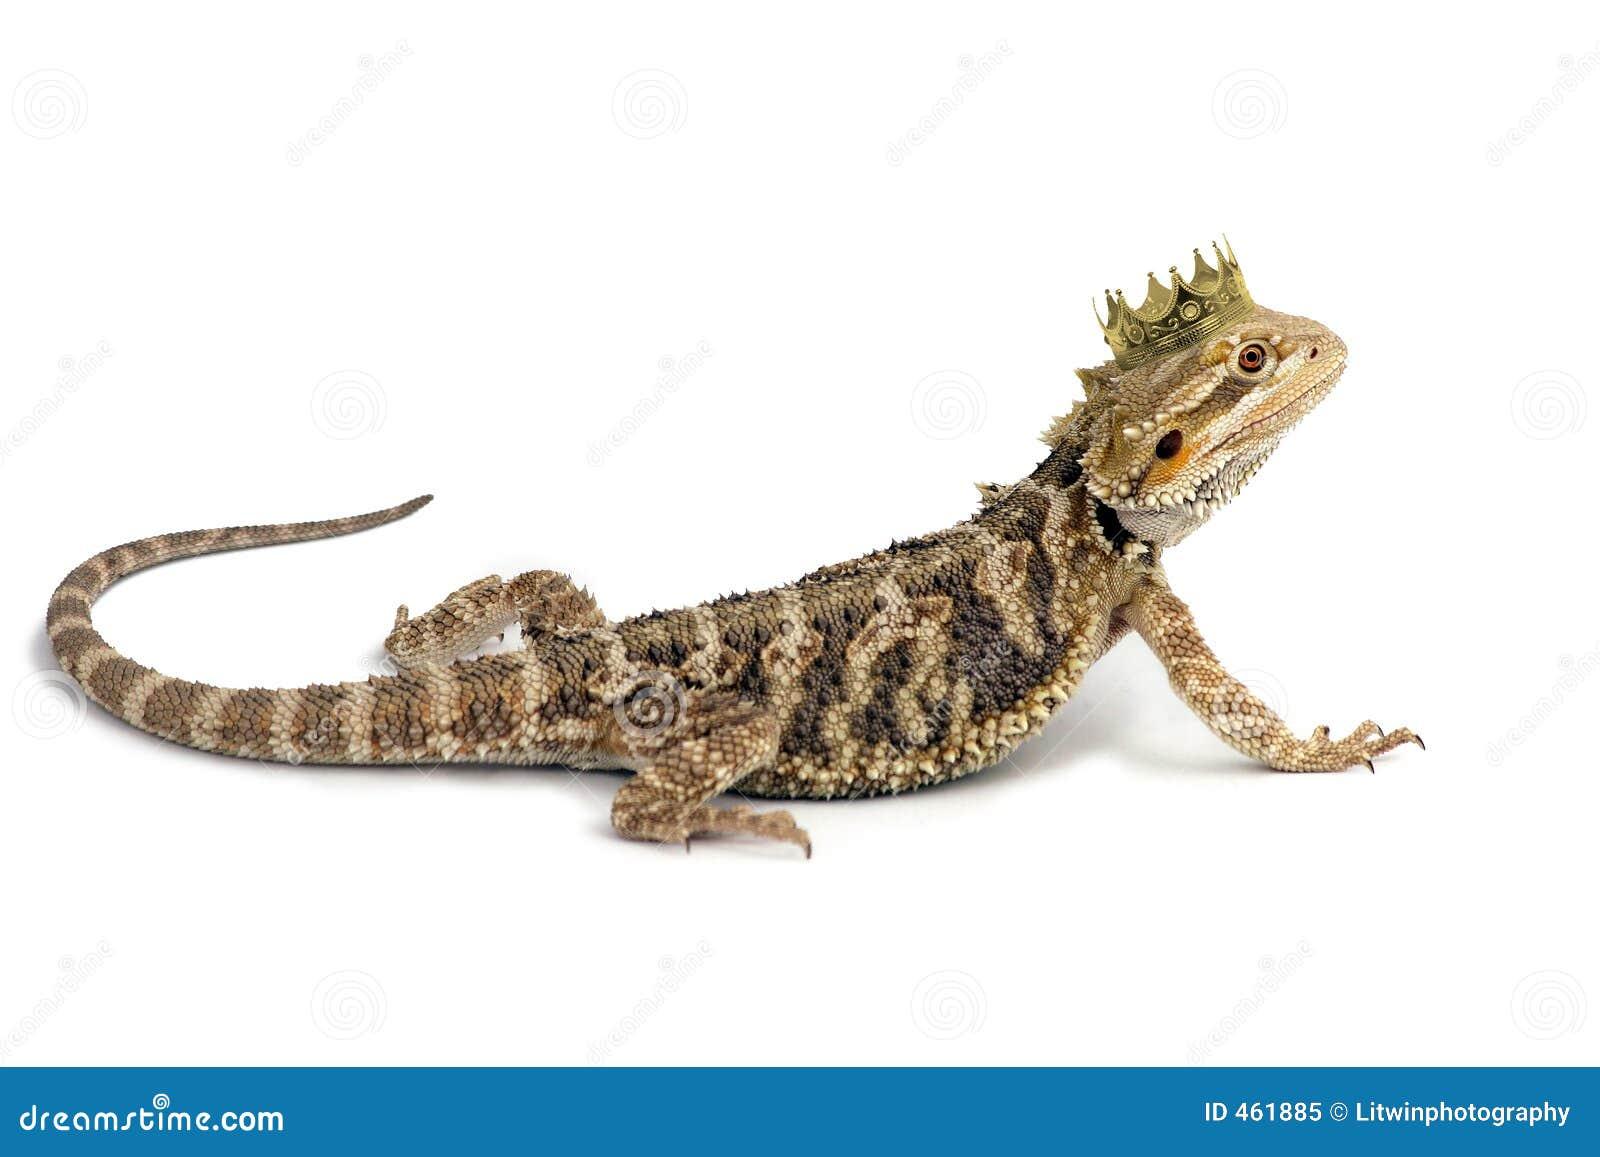 King Drake The Bearded Dragon Stock Image Image Of Import Eyes 461885